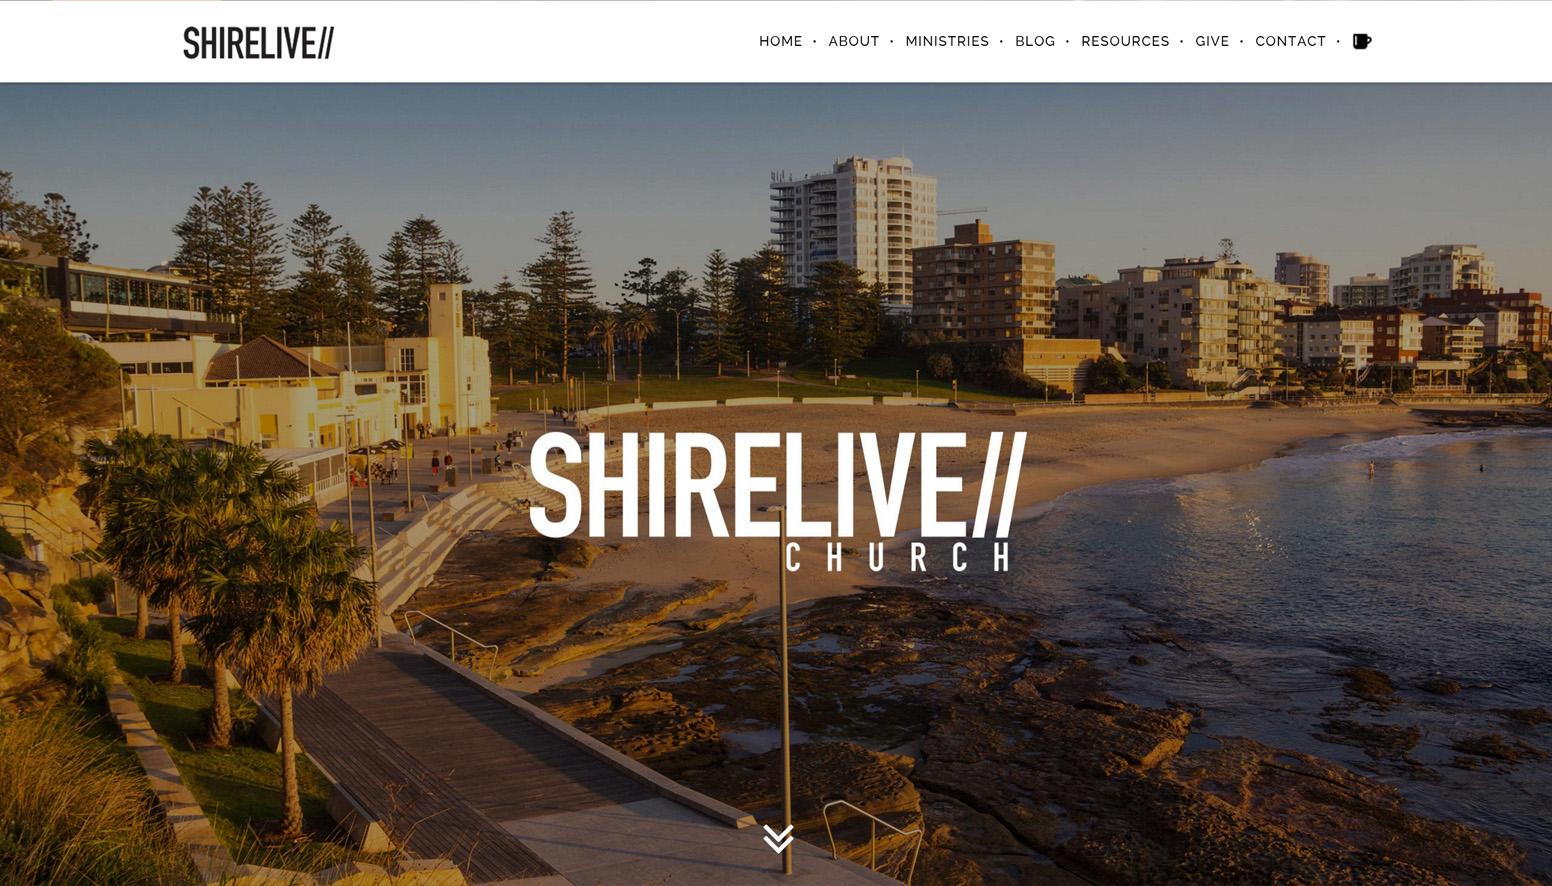 Shirelive - Church Website Screenshot